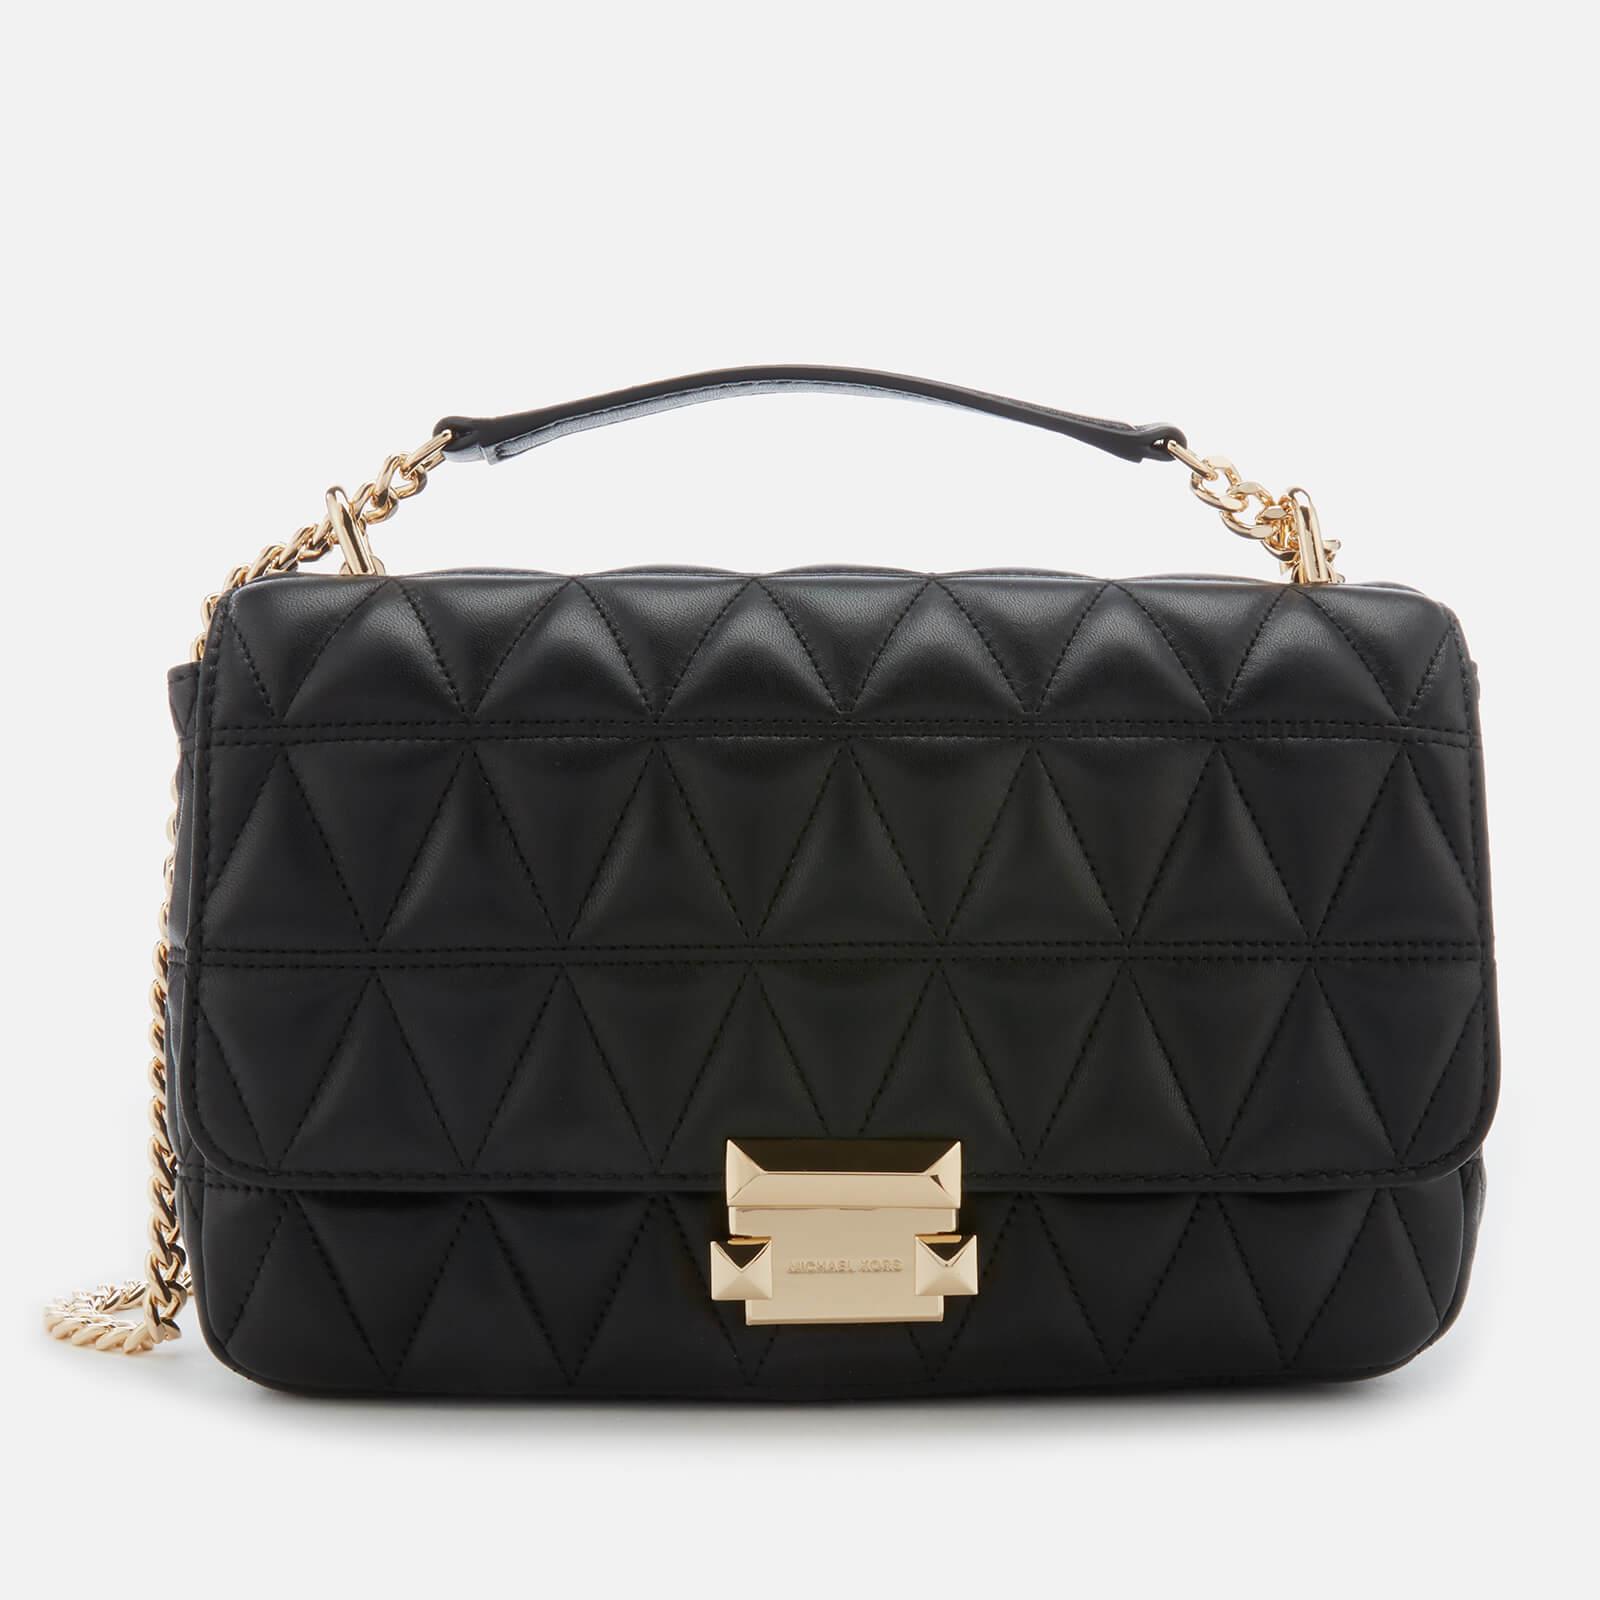 550fe6c97e80 MICHAEL MICHAEL KORS Women s Sloan Large Chain Shoulder Bag - Black ...